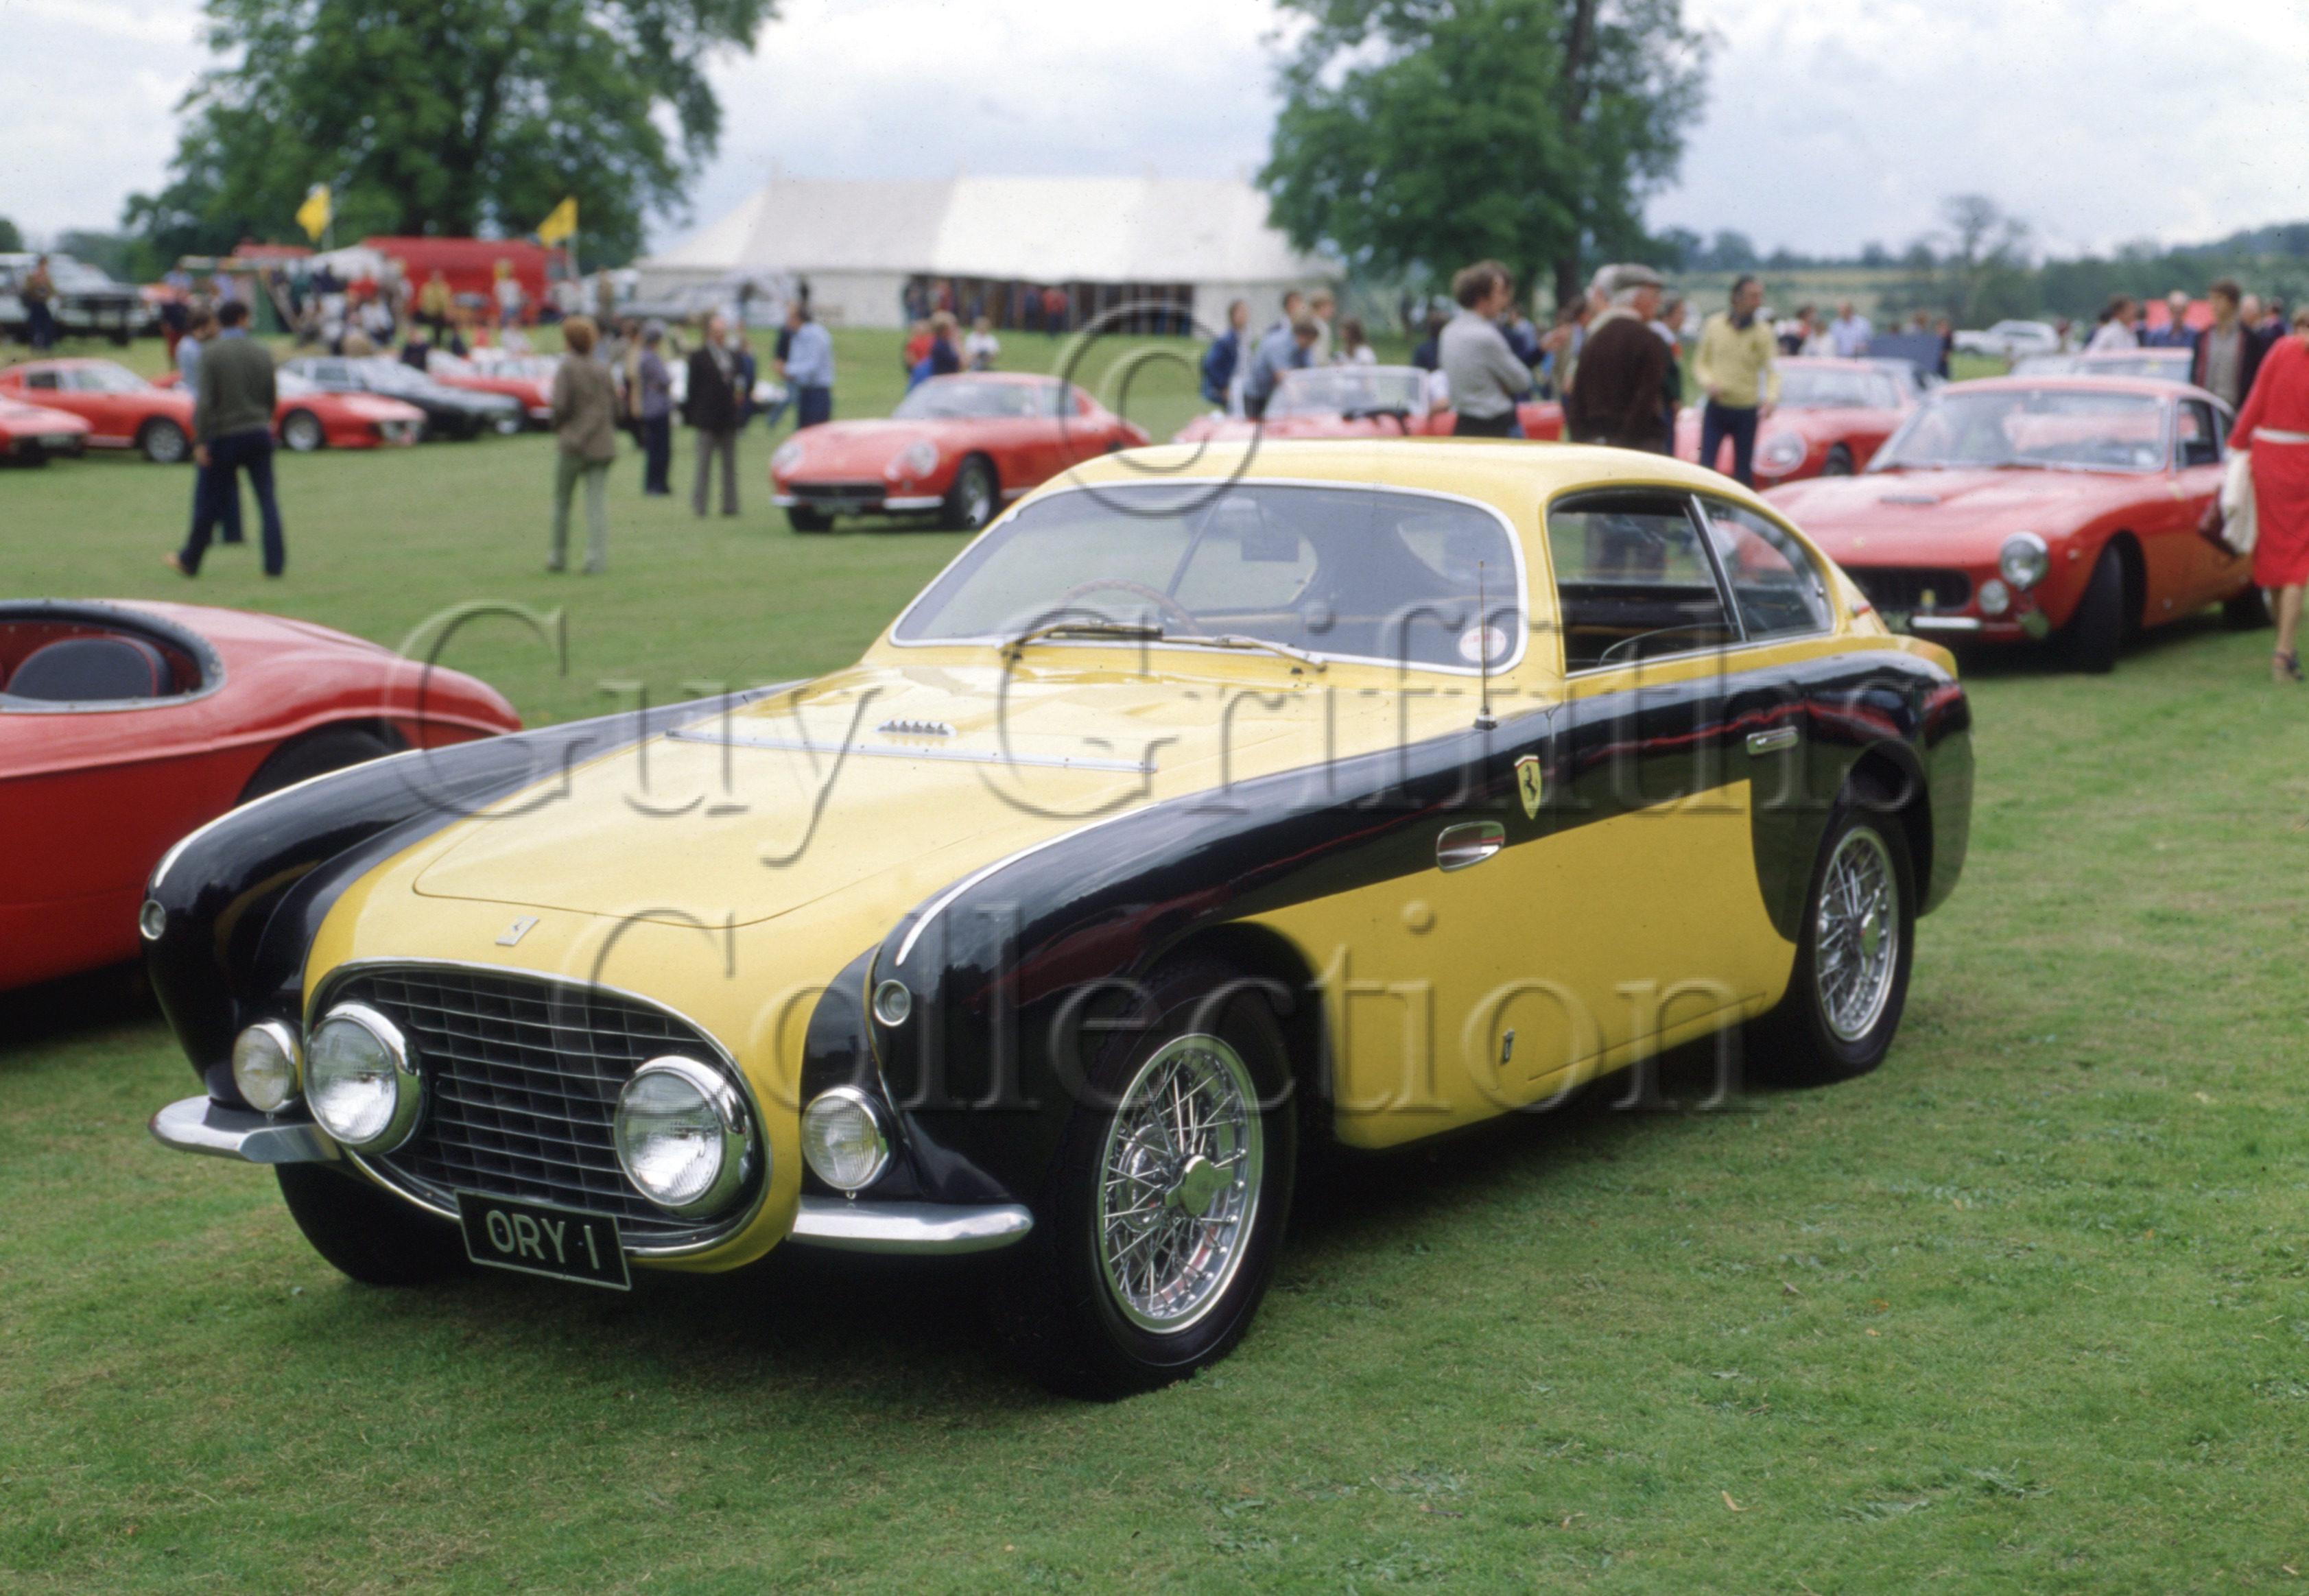 C-09-191–Ferrari–Honnington–06-07-1981.jpg - The Guy Griffiths Collection